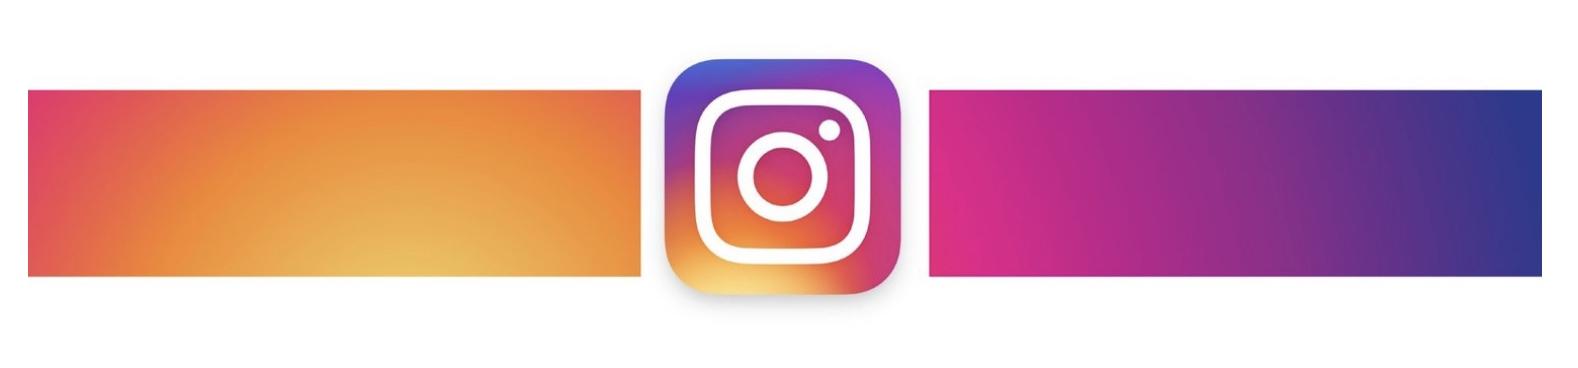 Instagram Bar.jpeg